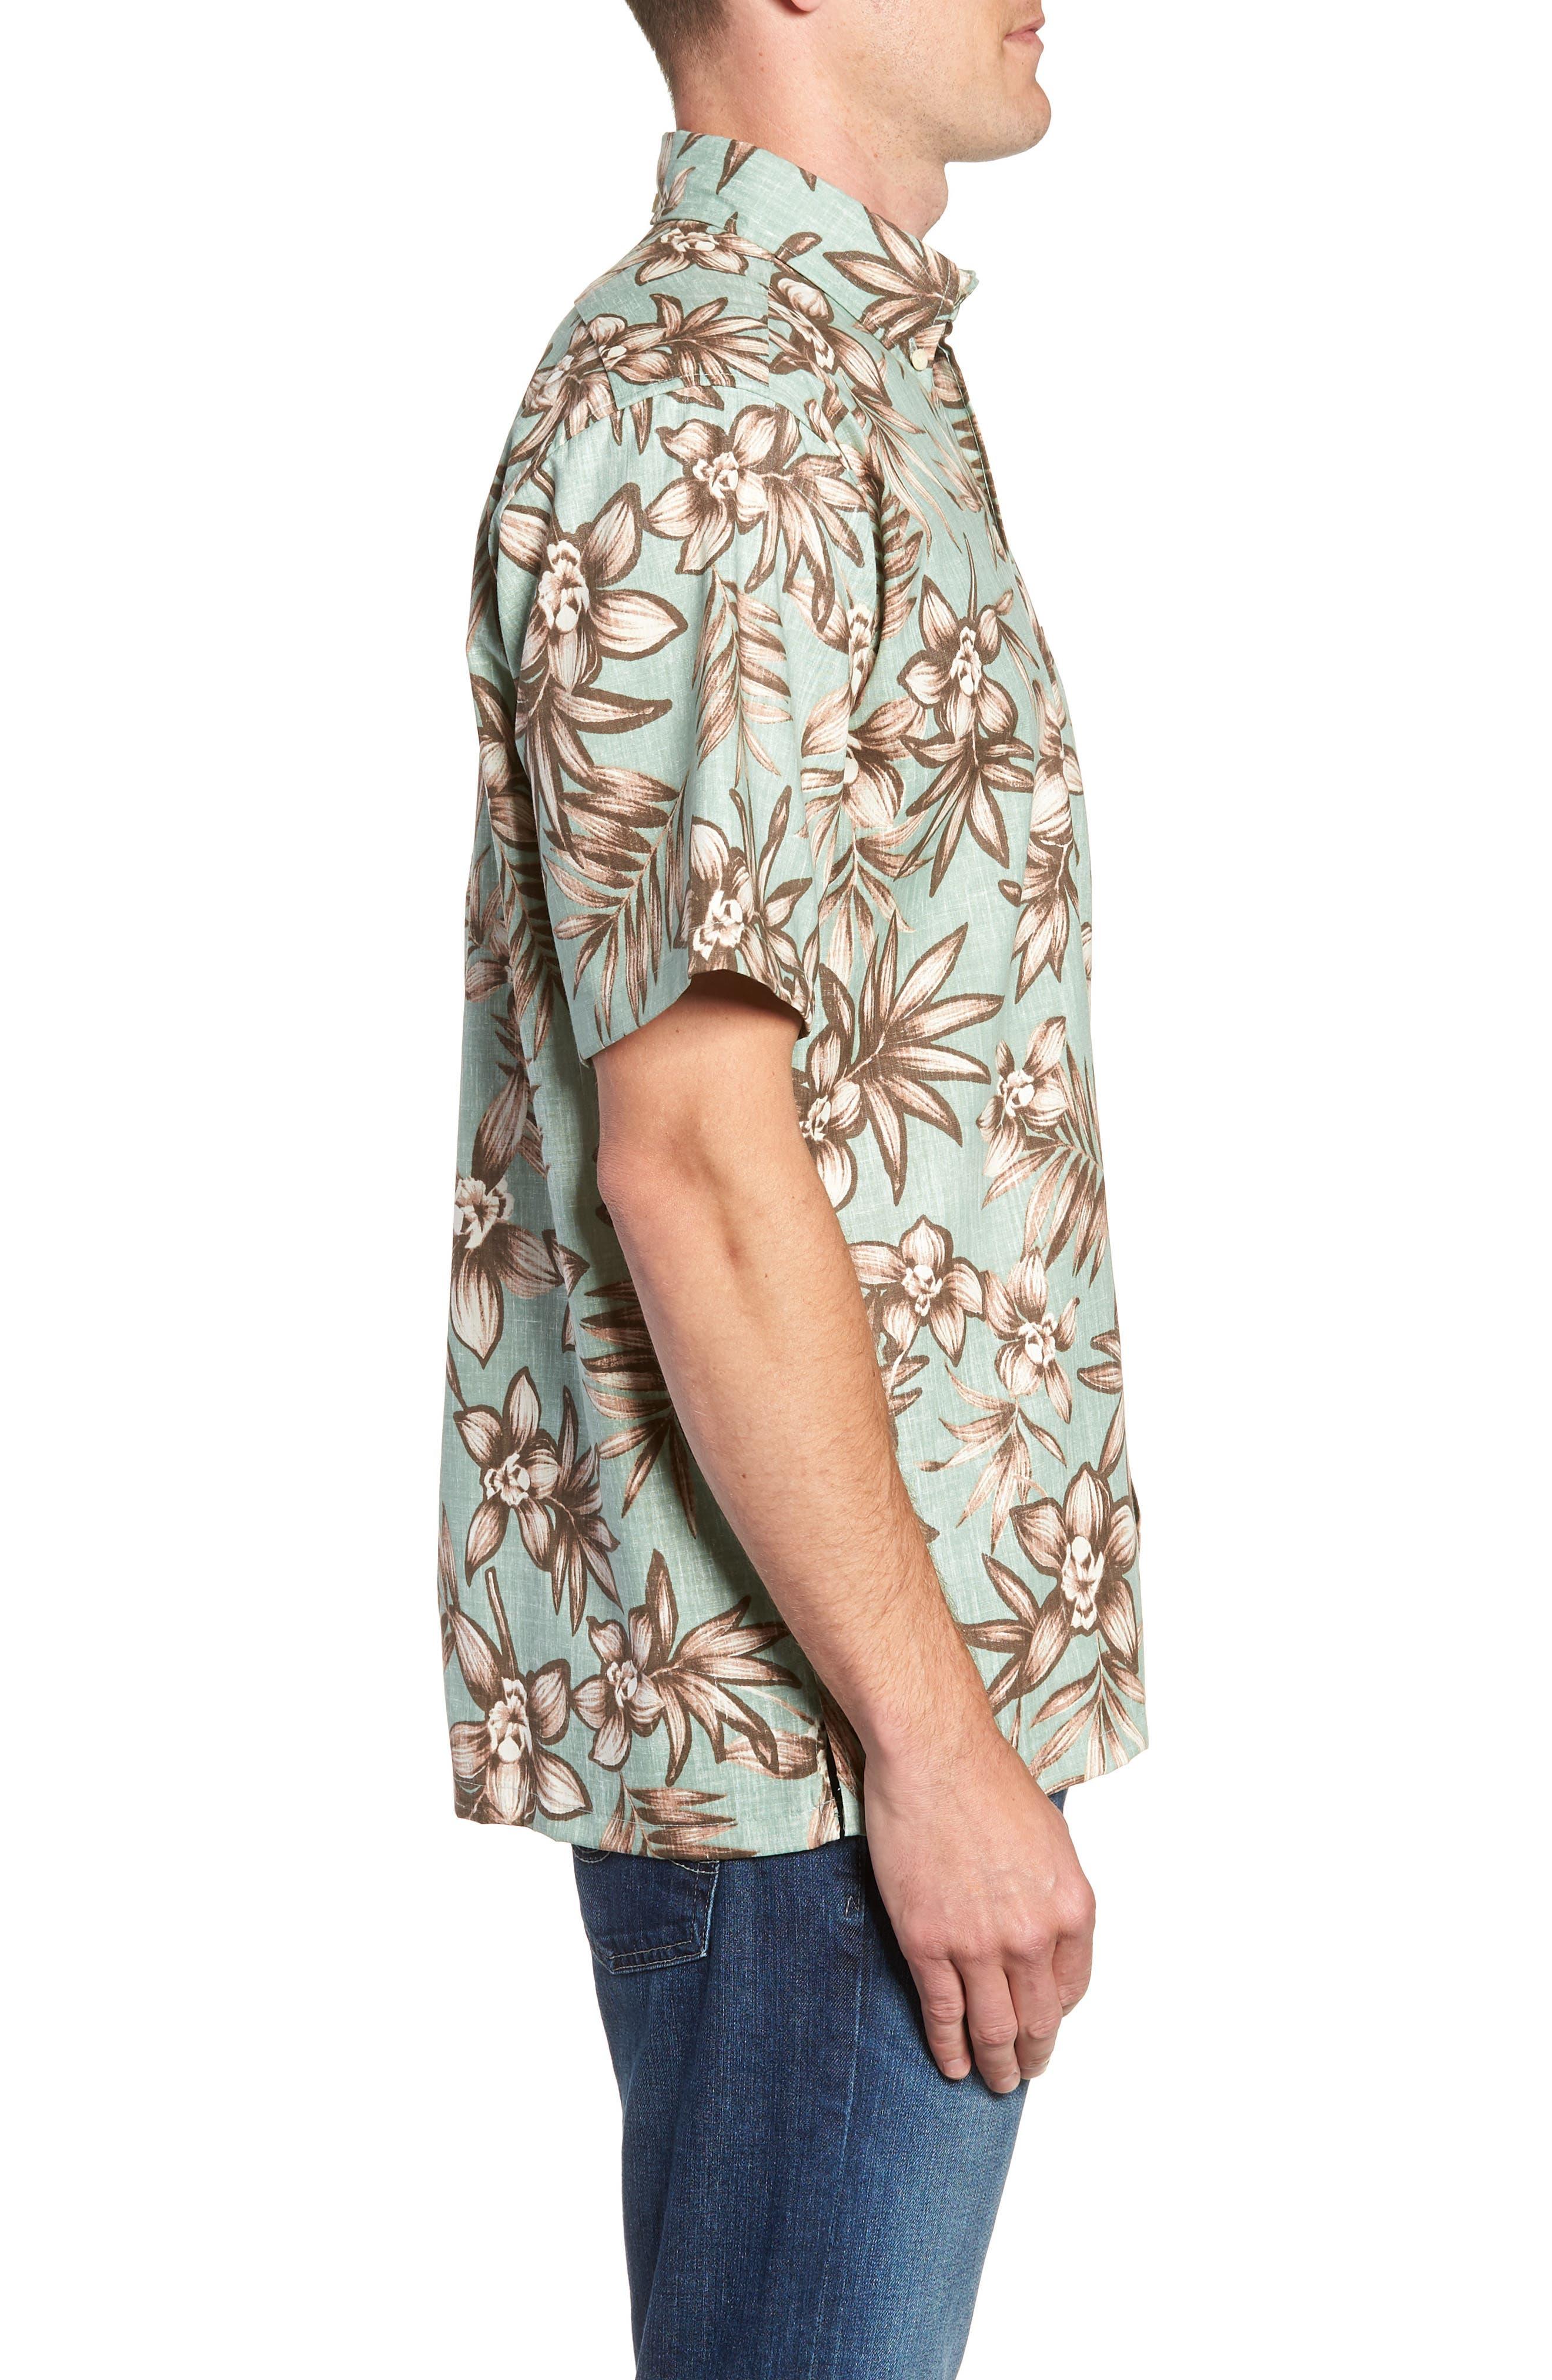 Onishi Garden Regular Fit Sport Shirt,                             Alternate thumbnail 4, color,                             Seafoam